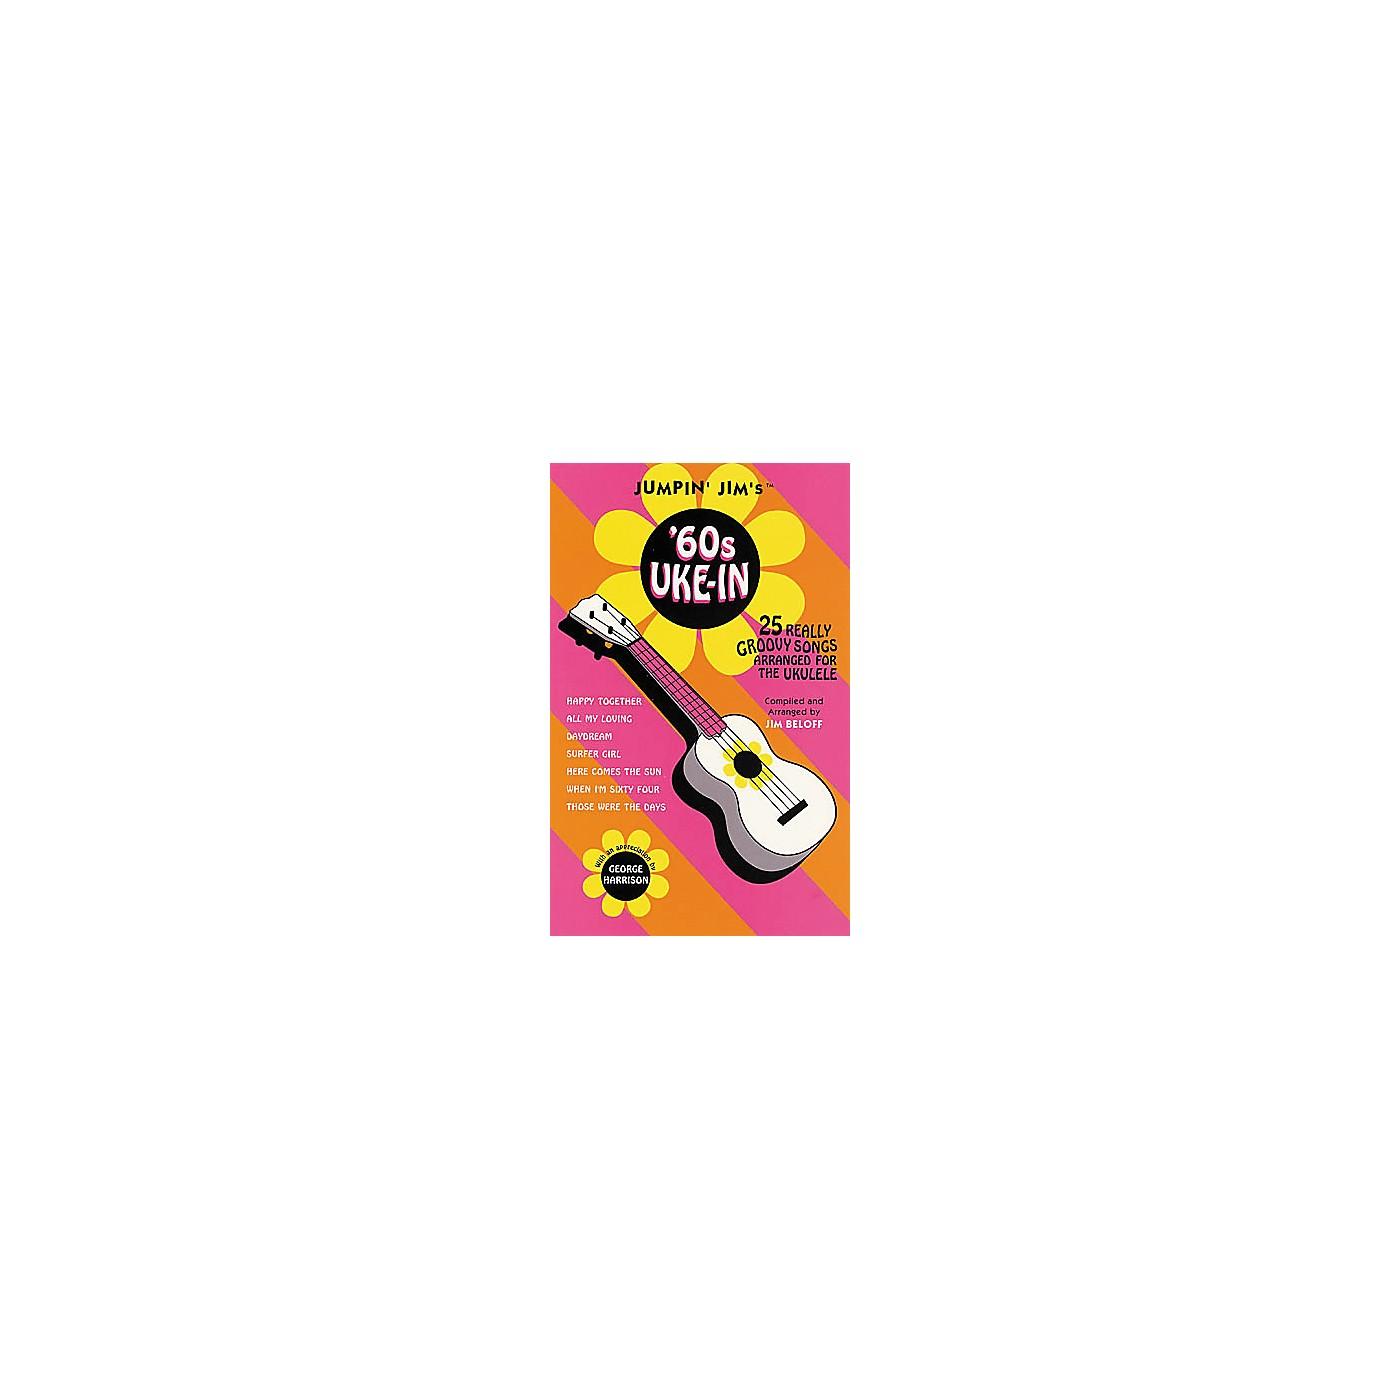 Hal Leonard Jumpin' Jim's '60s Uke-In Tab Songbook thumbnail